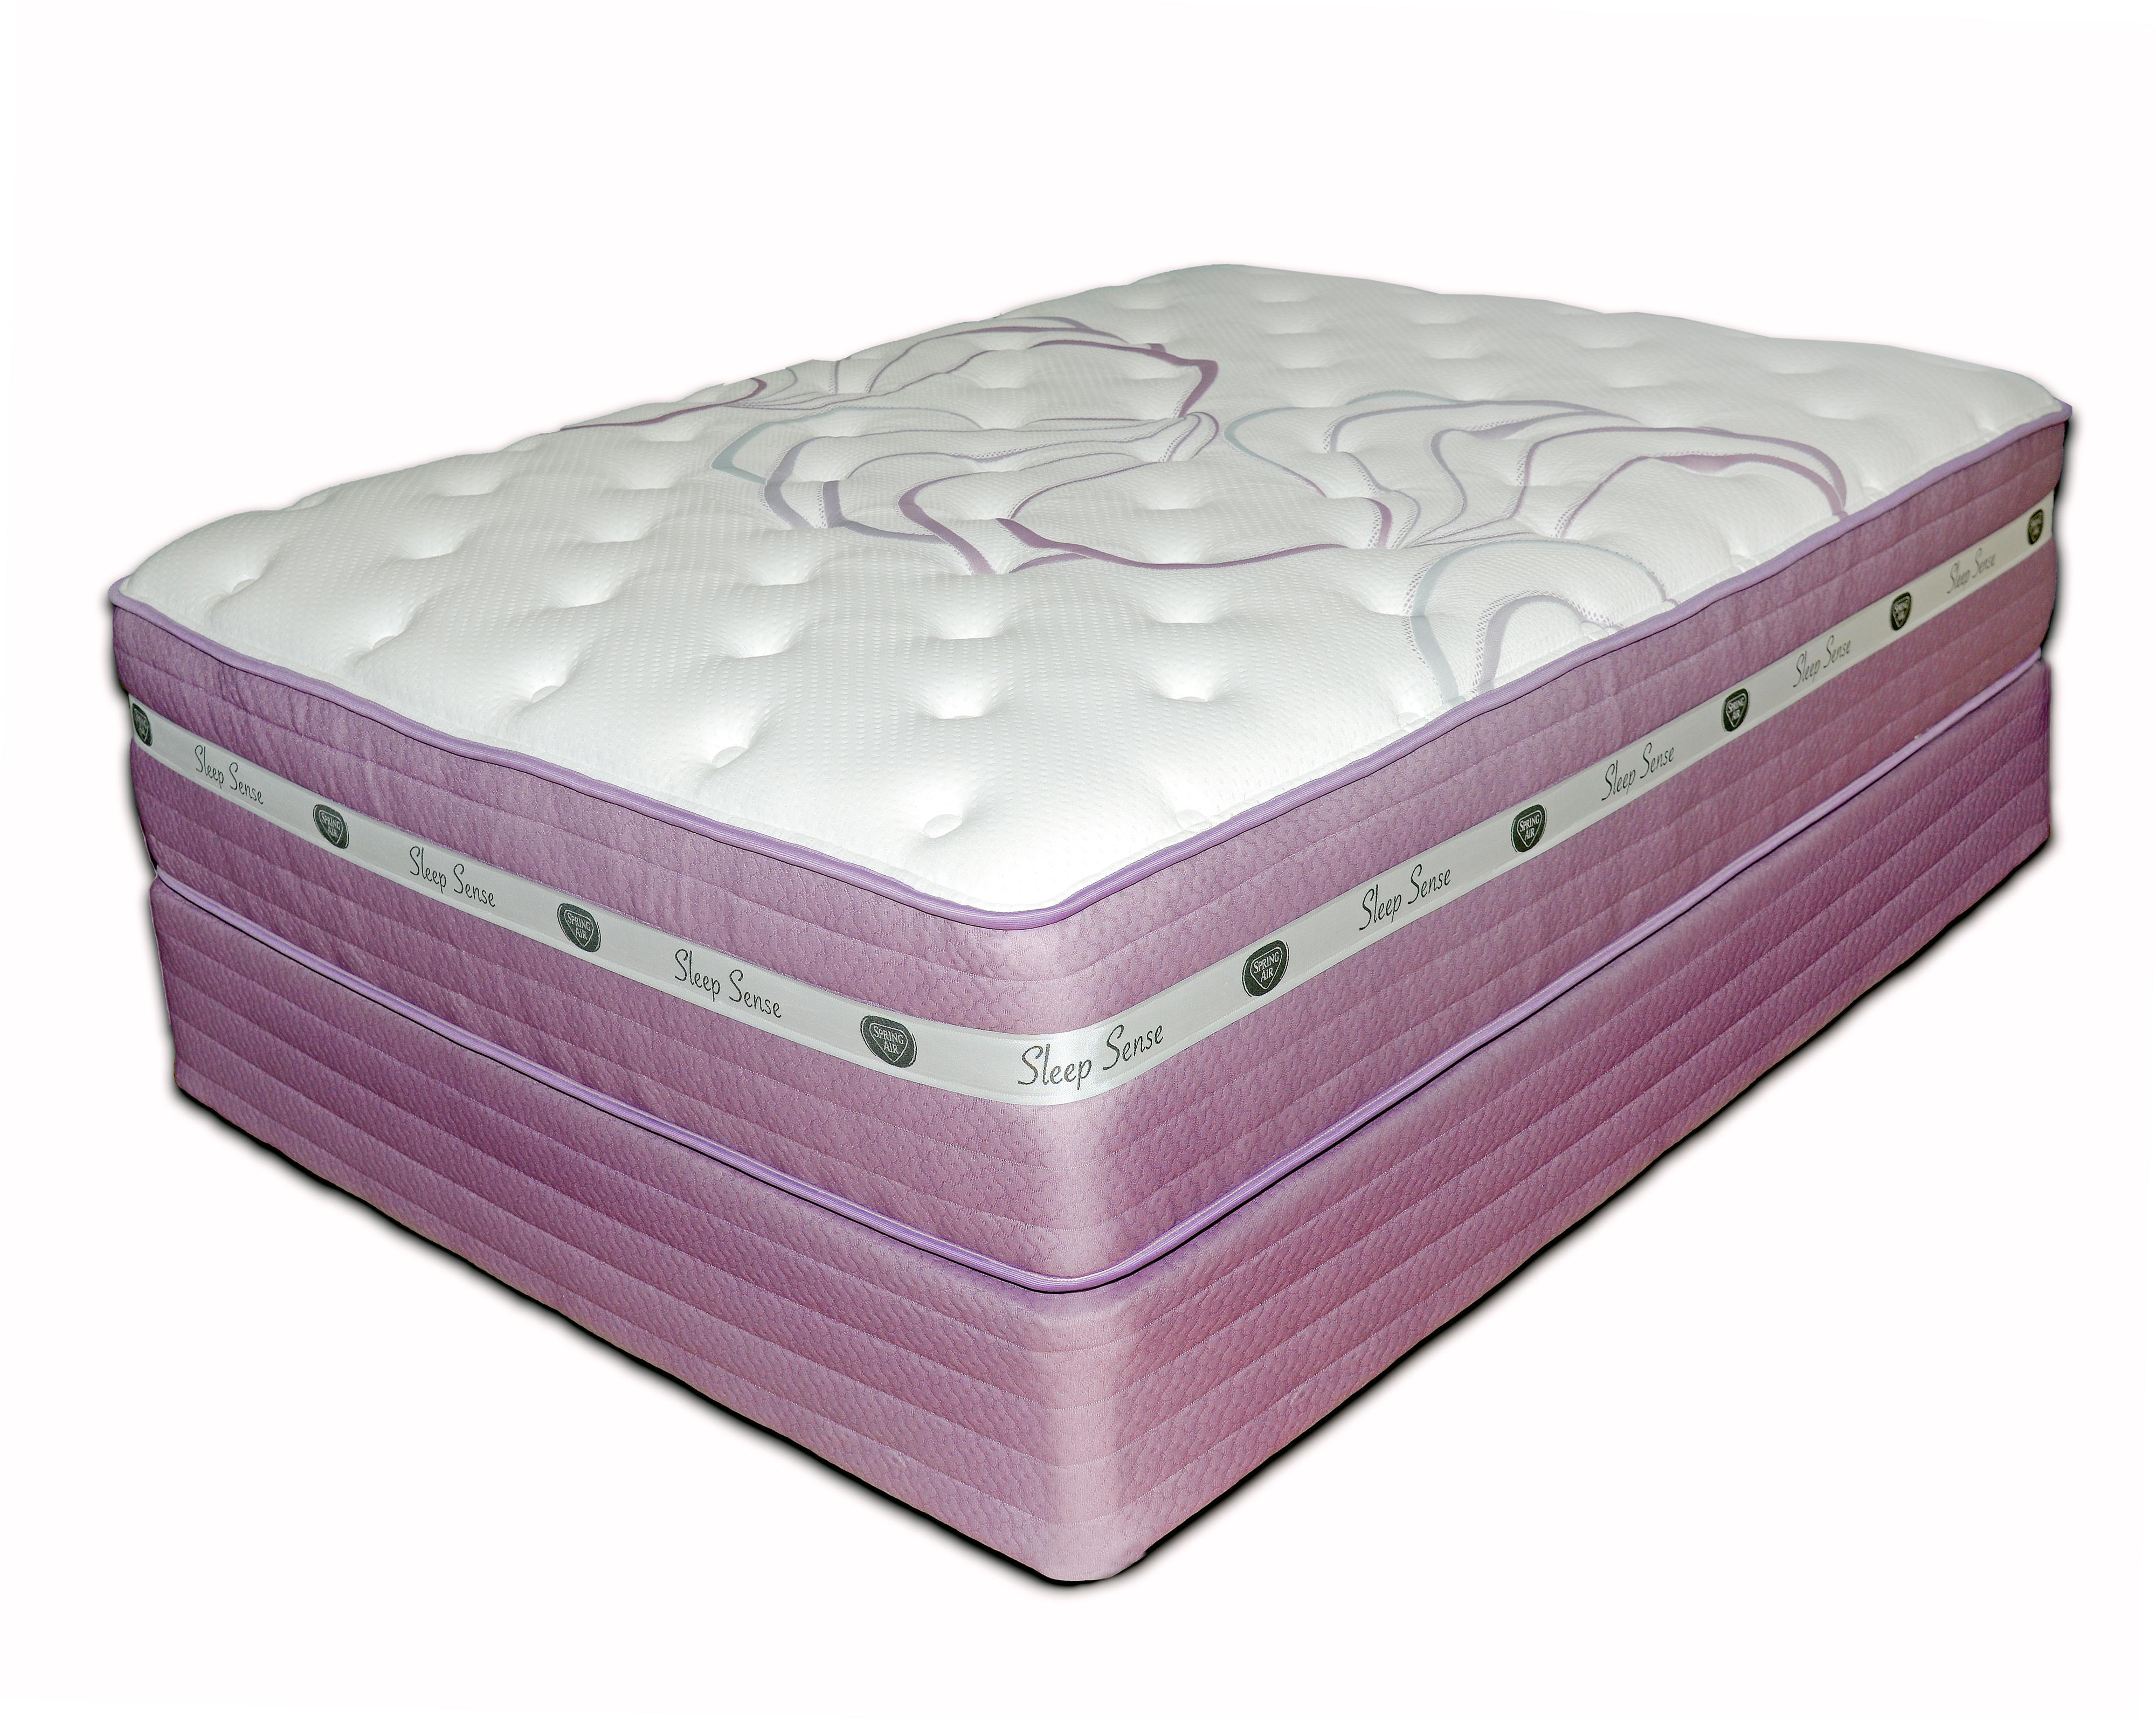 "Sleep Sense Purple Queen 14.5"" Latex Hybrid Mattress Set by Spring Air at Mueller Furniture"